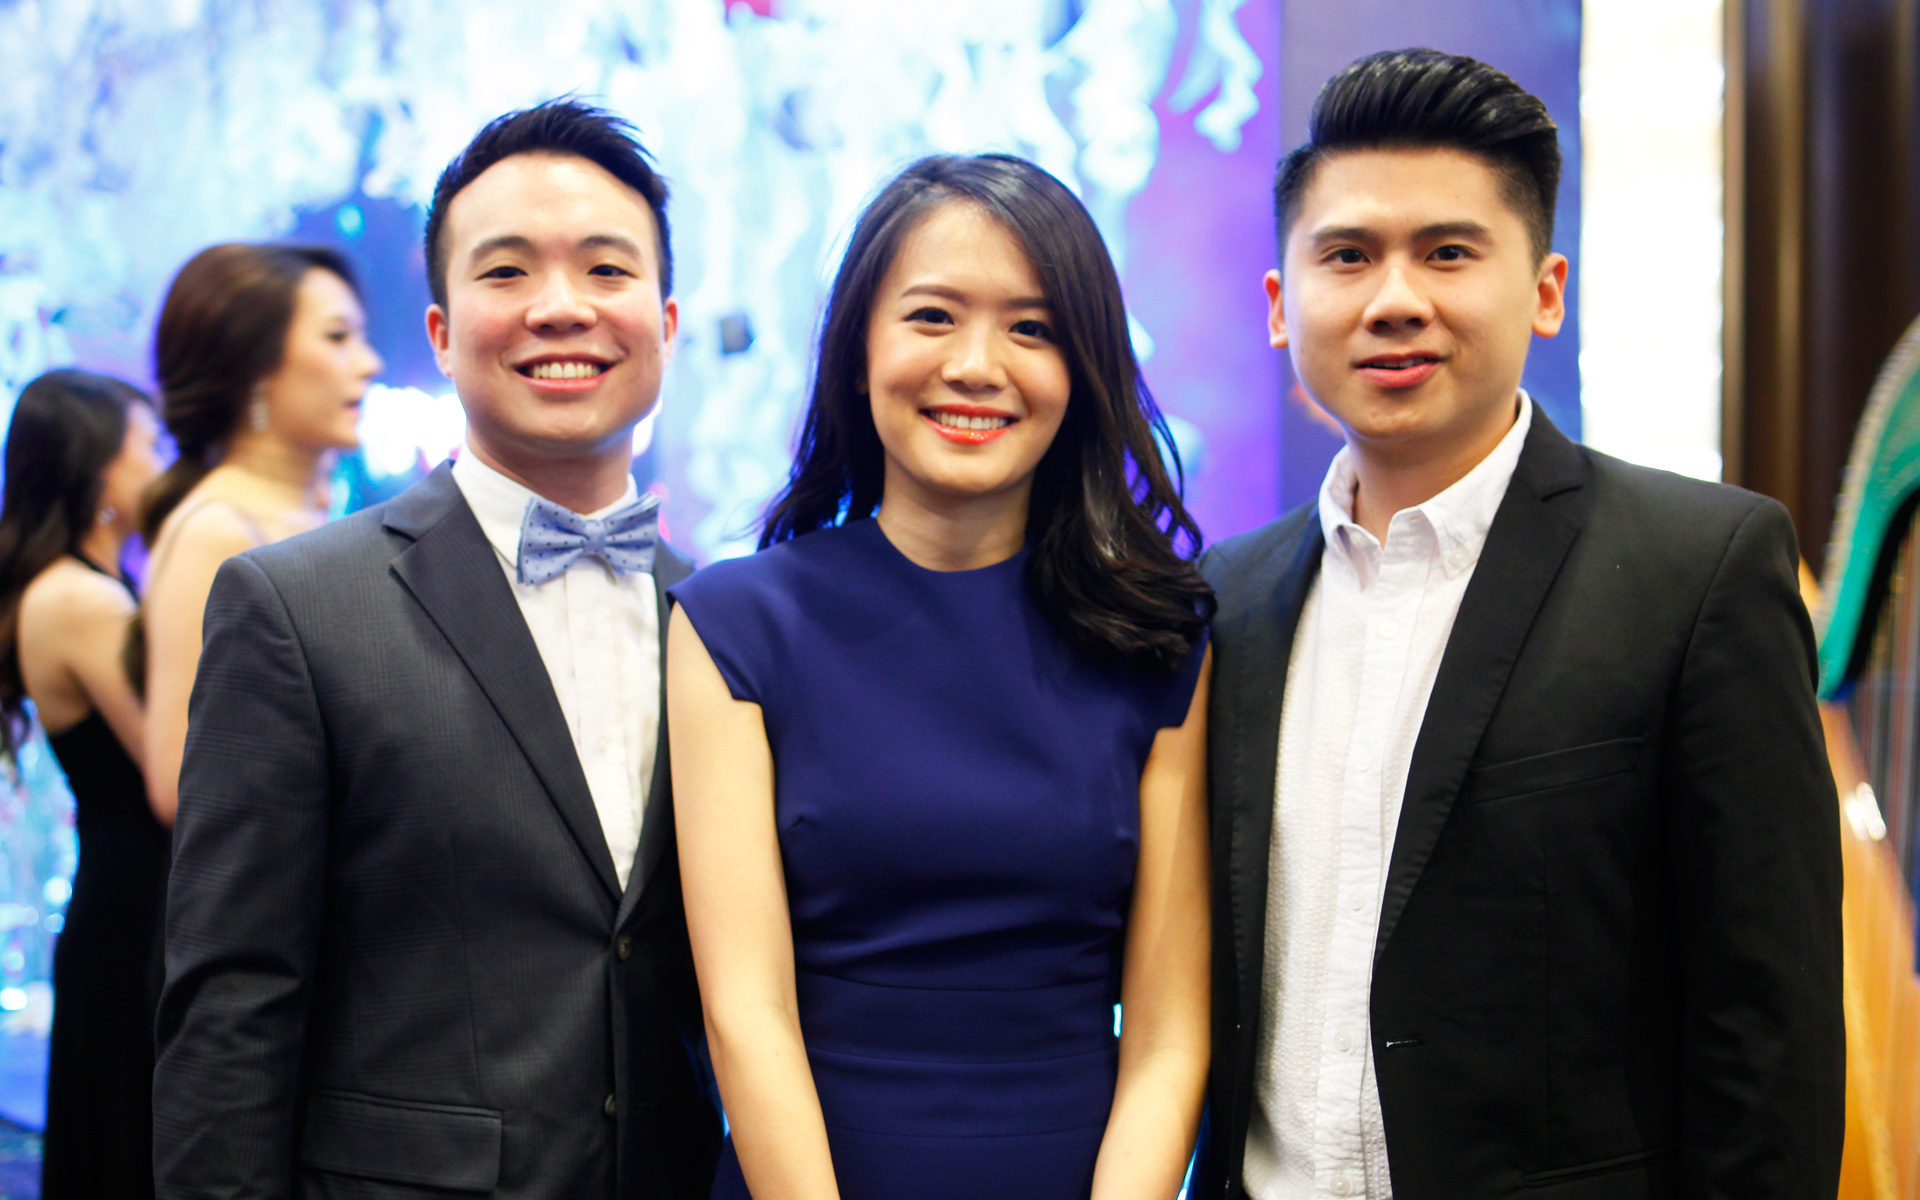 Joevy Lau, Ming Ling Tan and Sheng Keng Yap